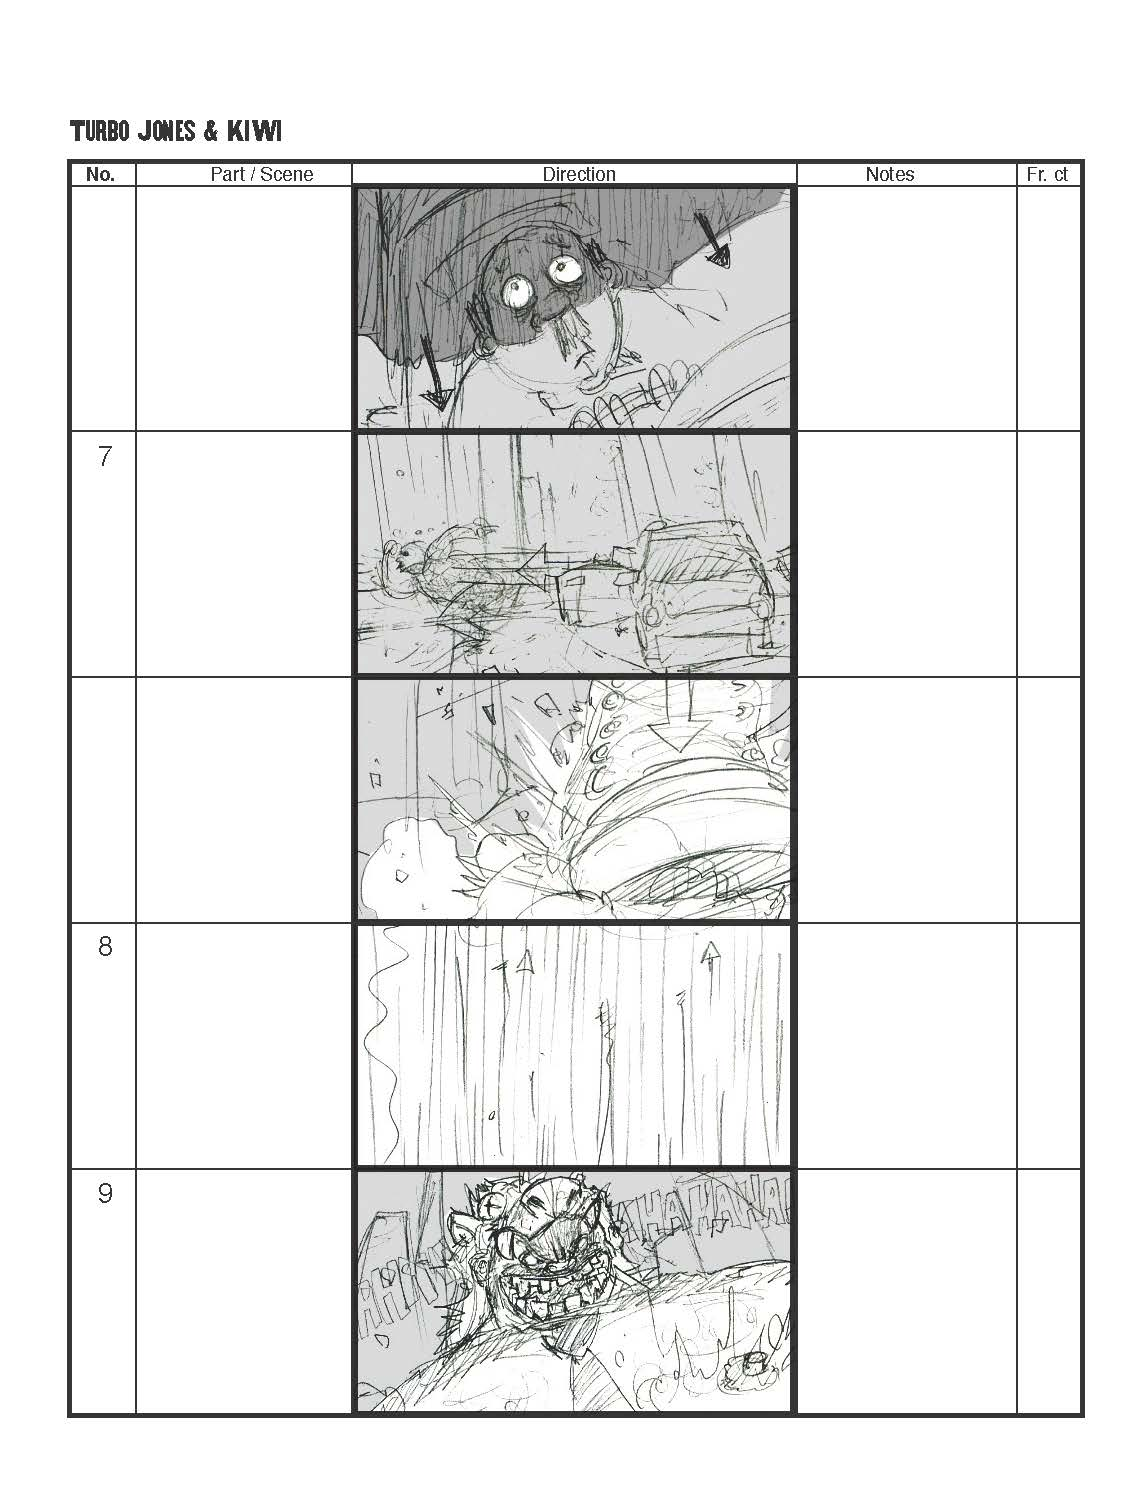 TJK_Storyboards_v01_HIGH_Page_04.jpg